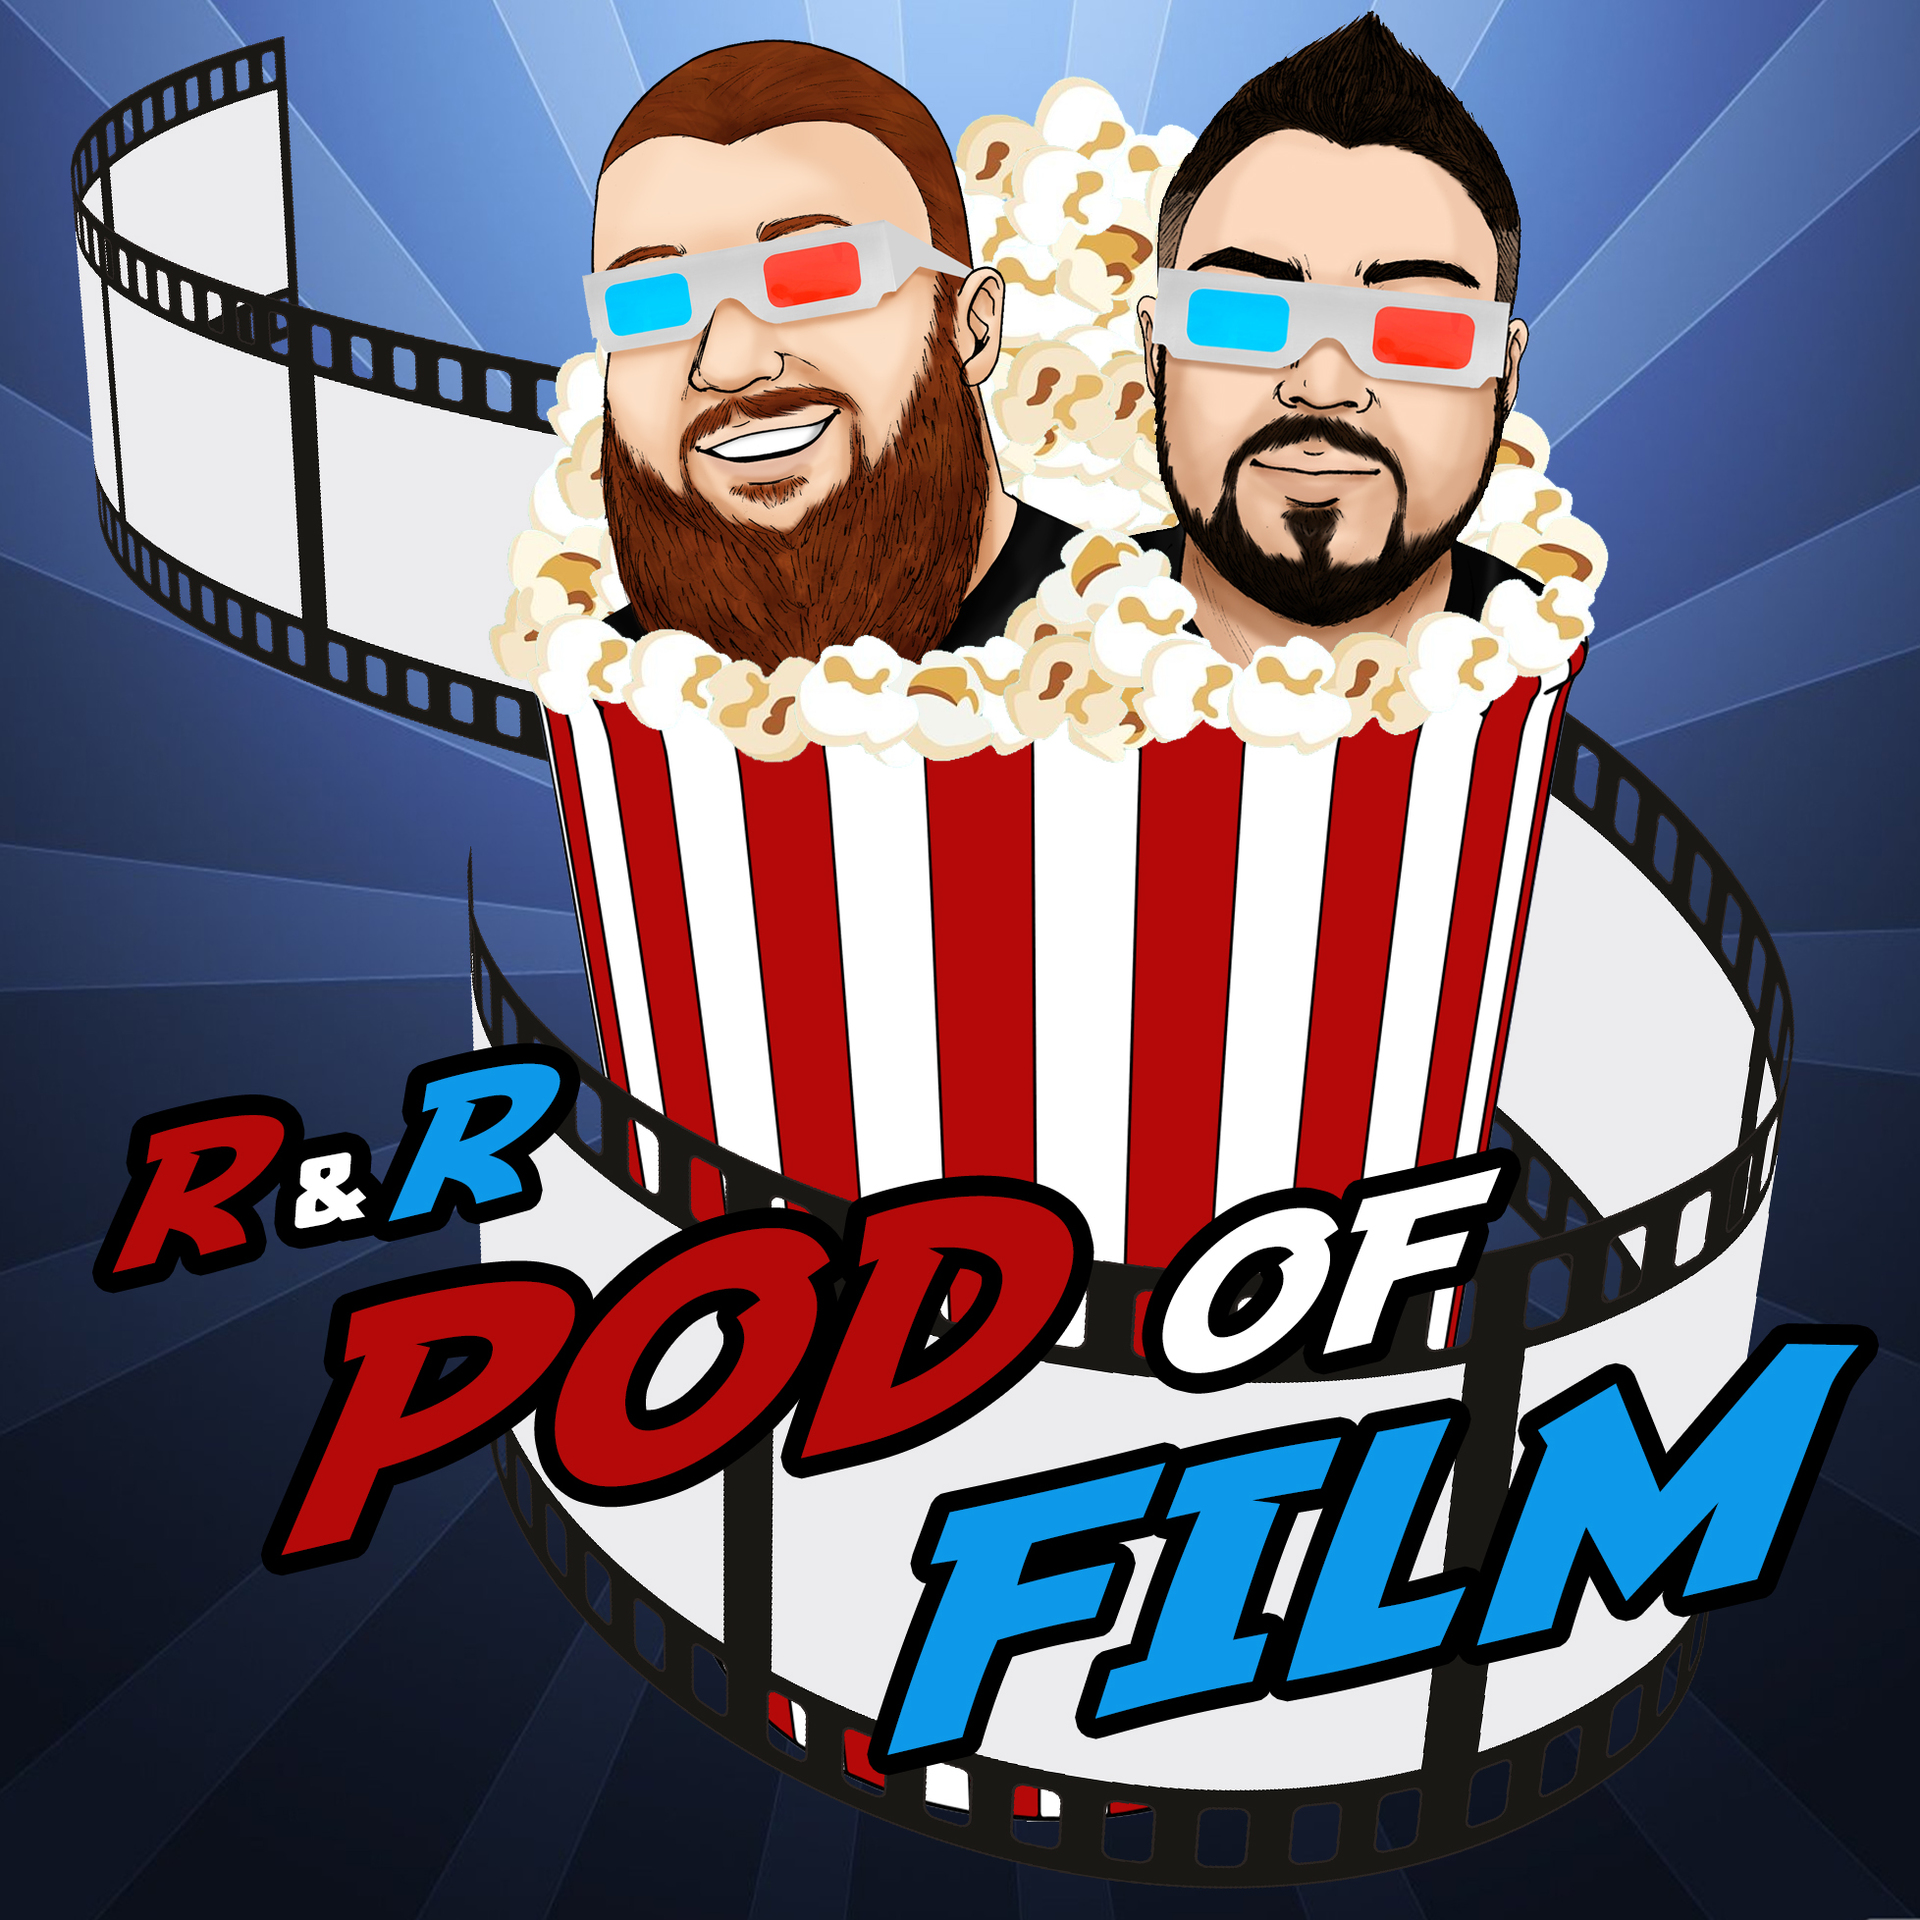 R&R Pod of Film